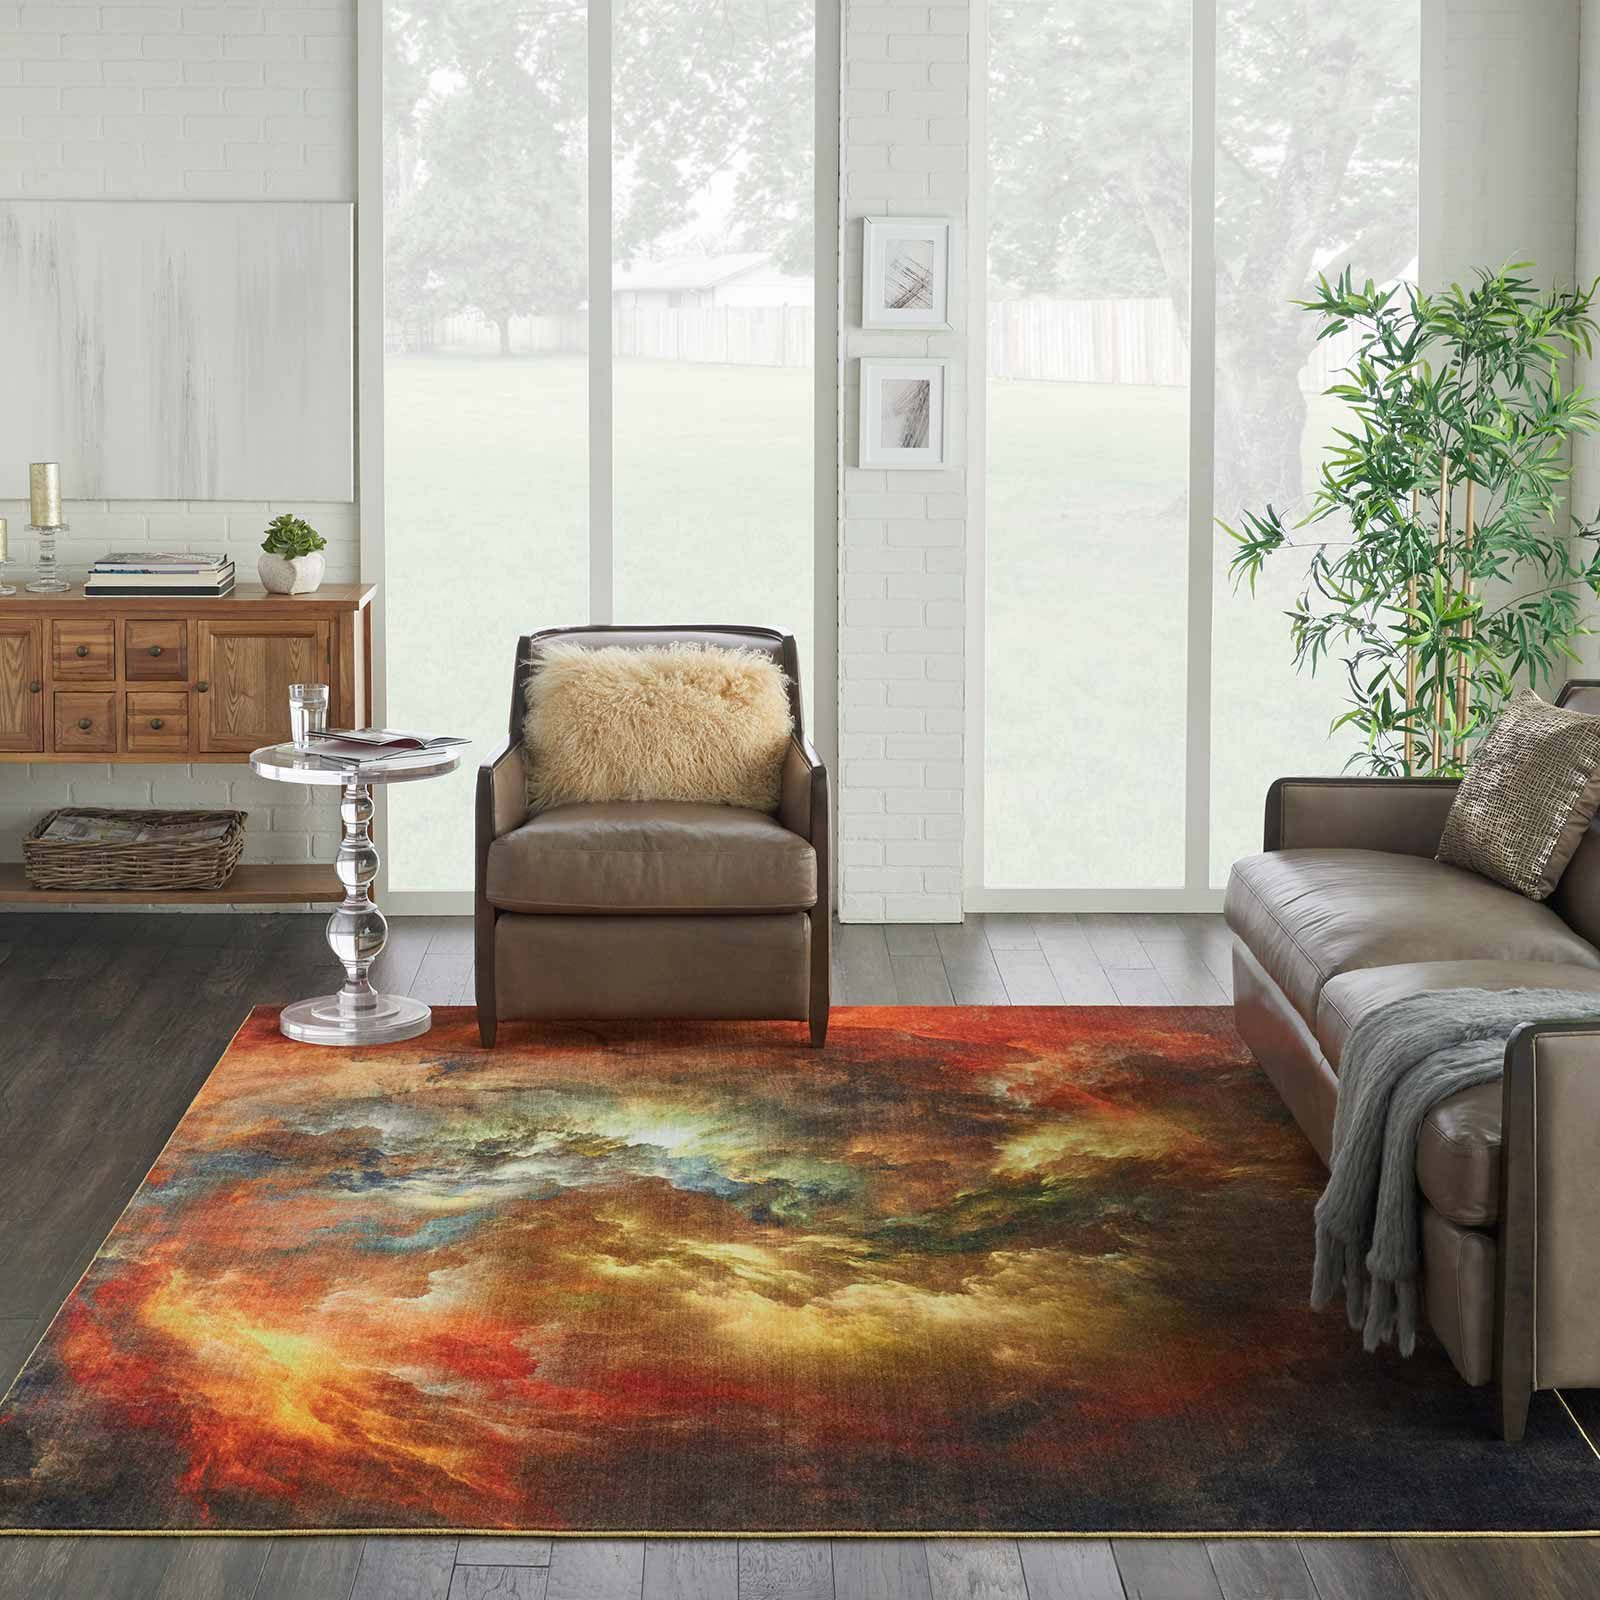 Nourison rug LREVE LER07 REDMT RED MULTICOLOR 9x12 099446494832 interior 1 C